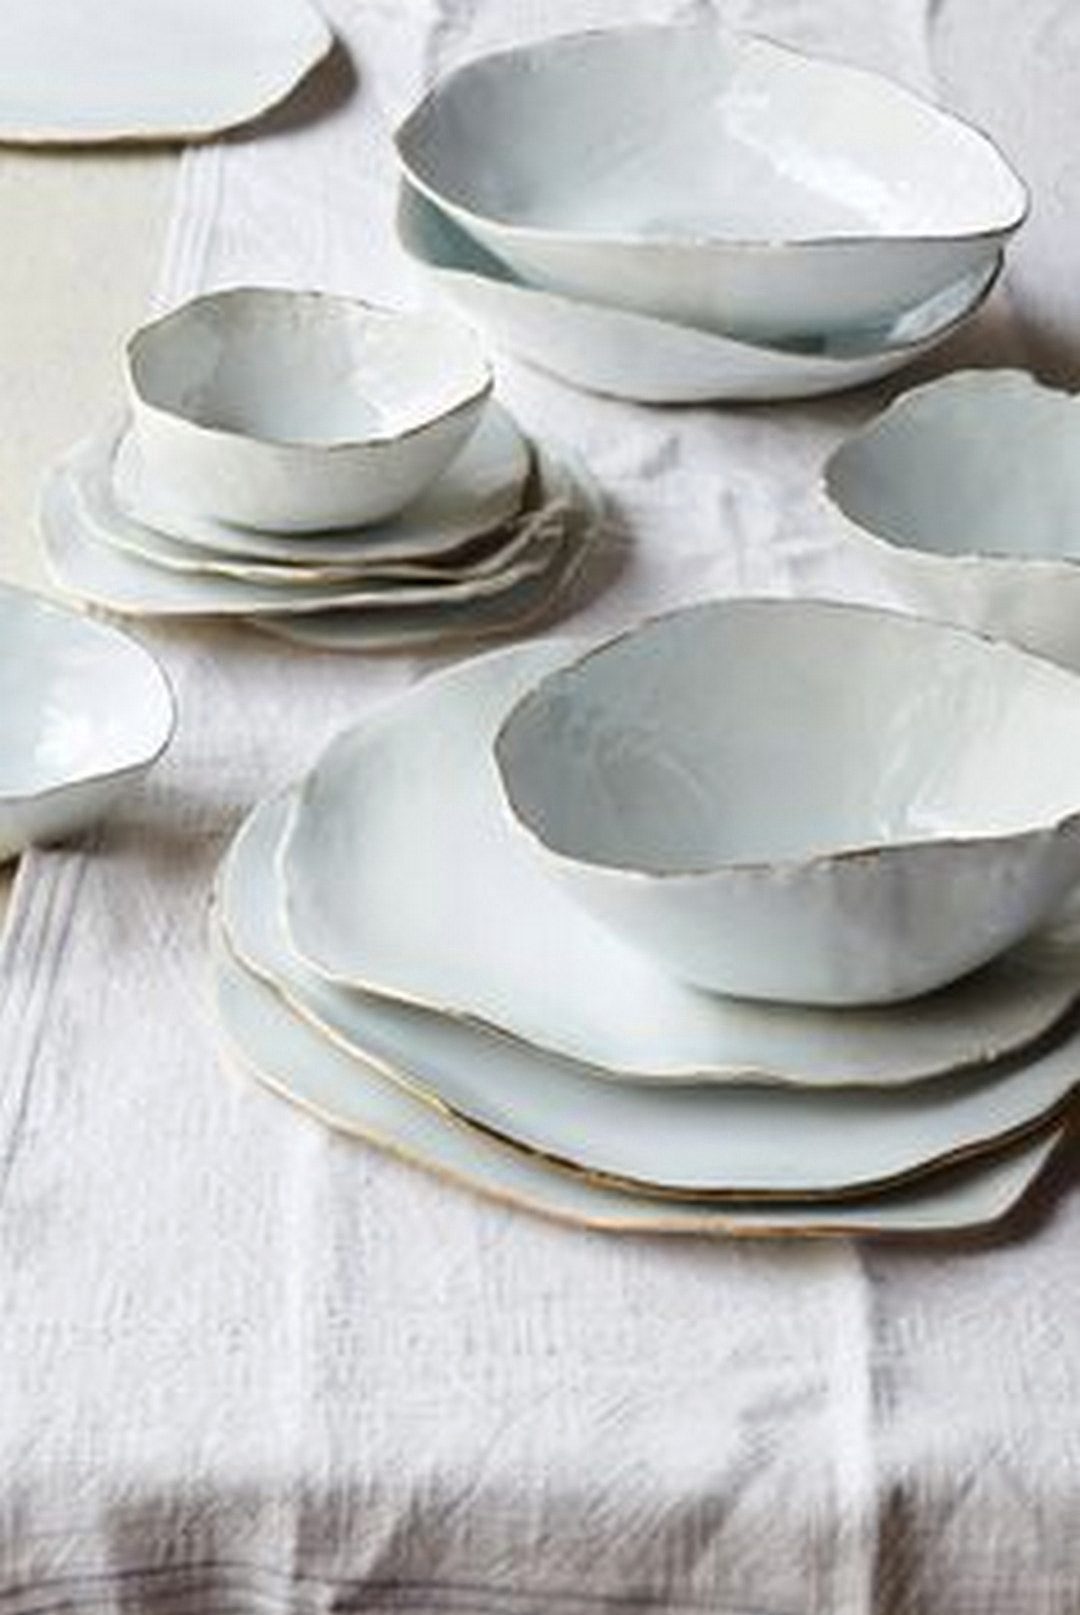 Decorative plates set of 4 & Set Of 4 Decorative Plates - Foter